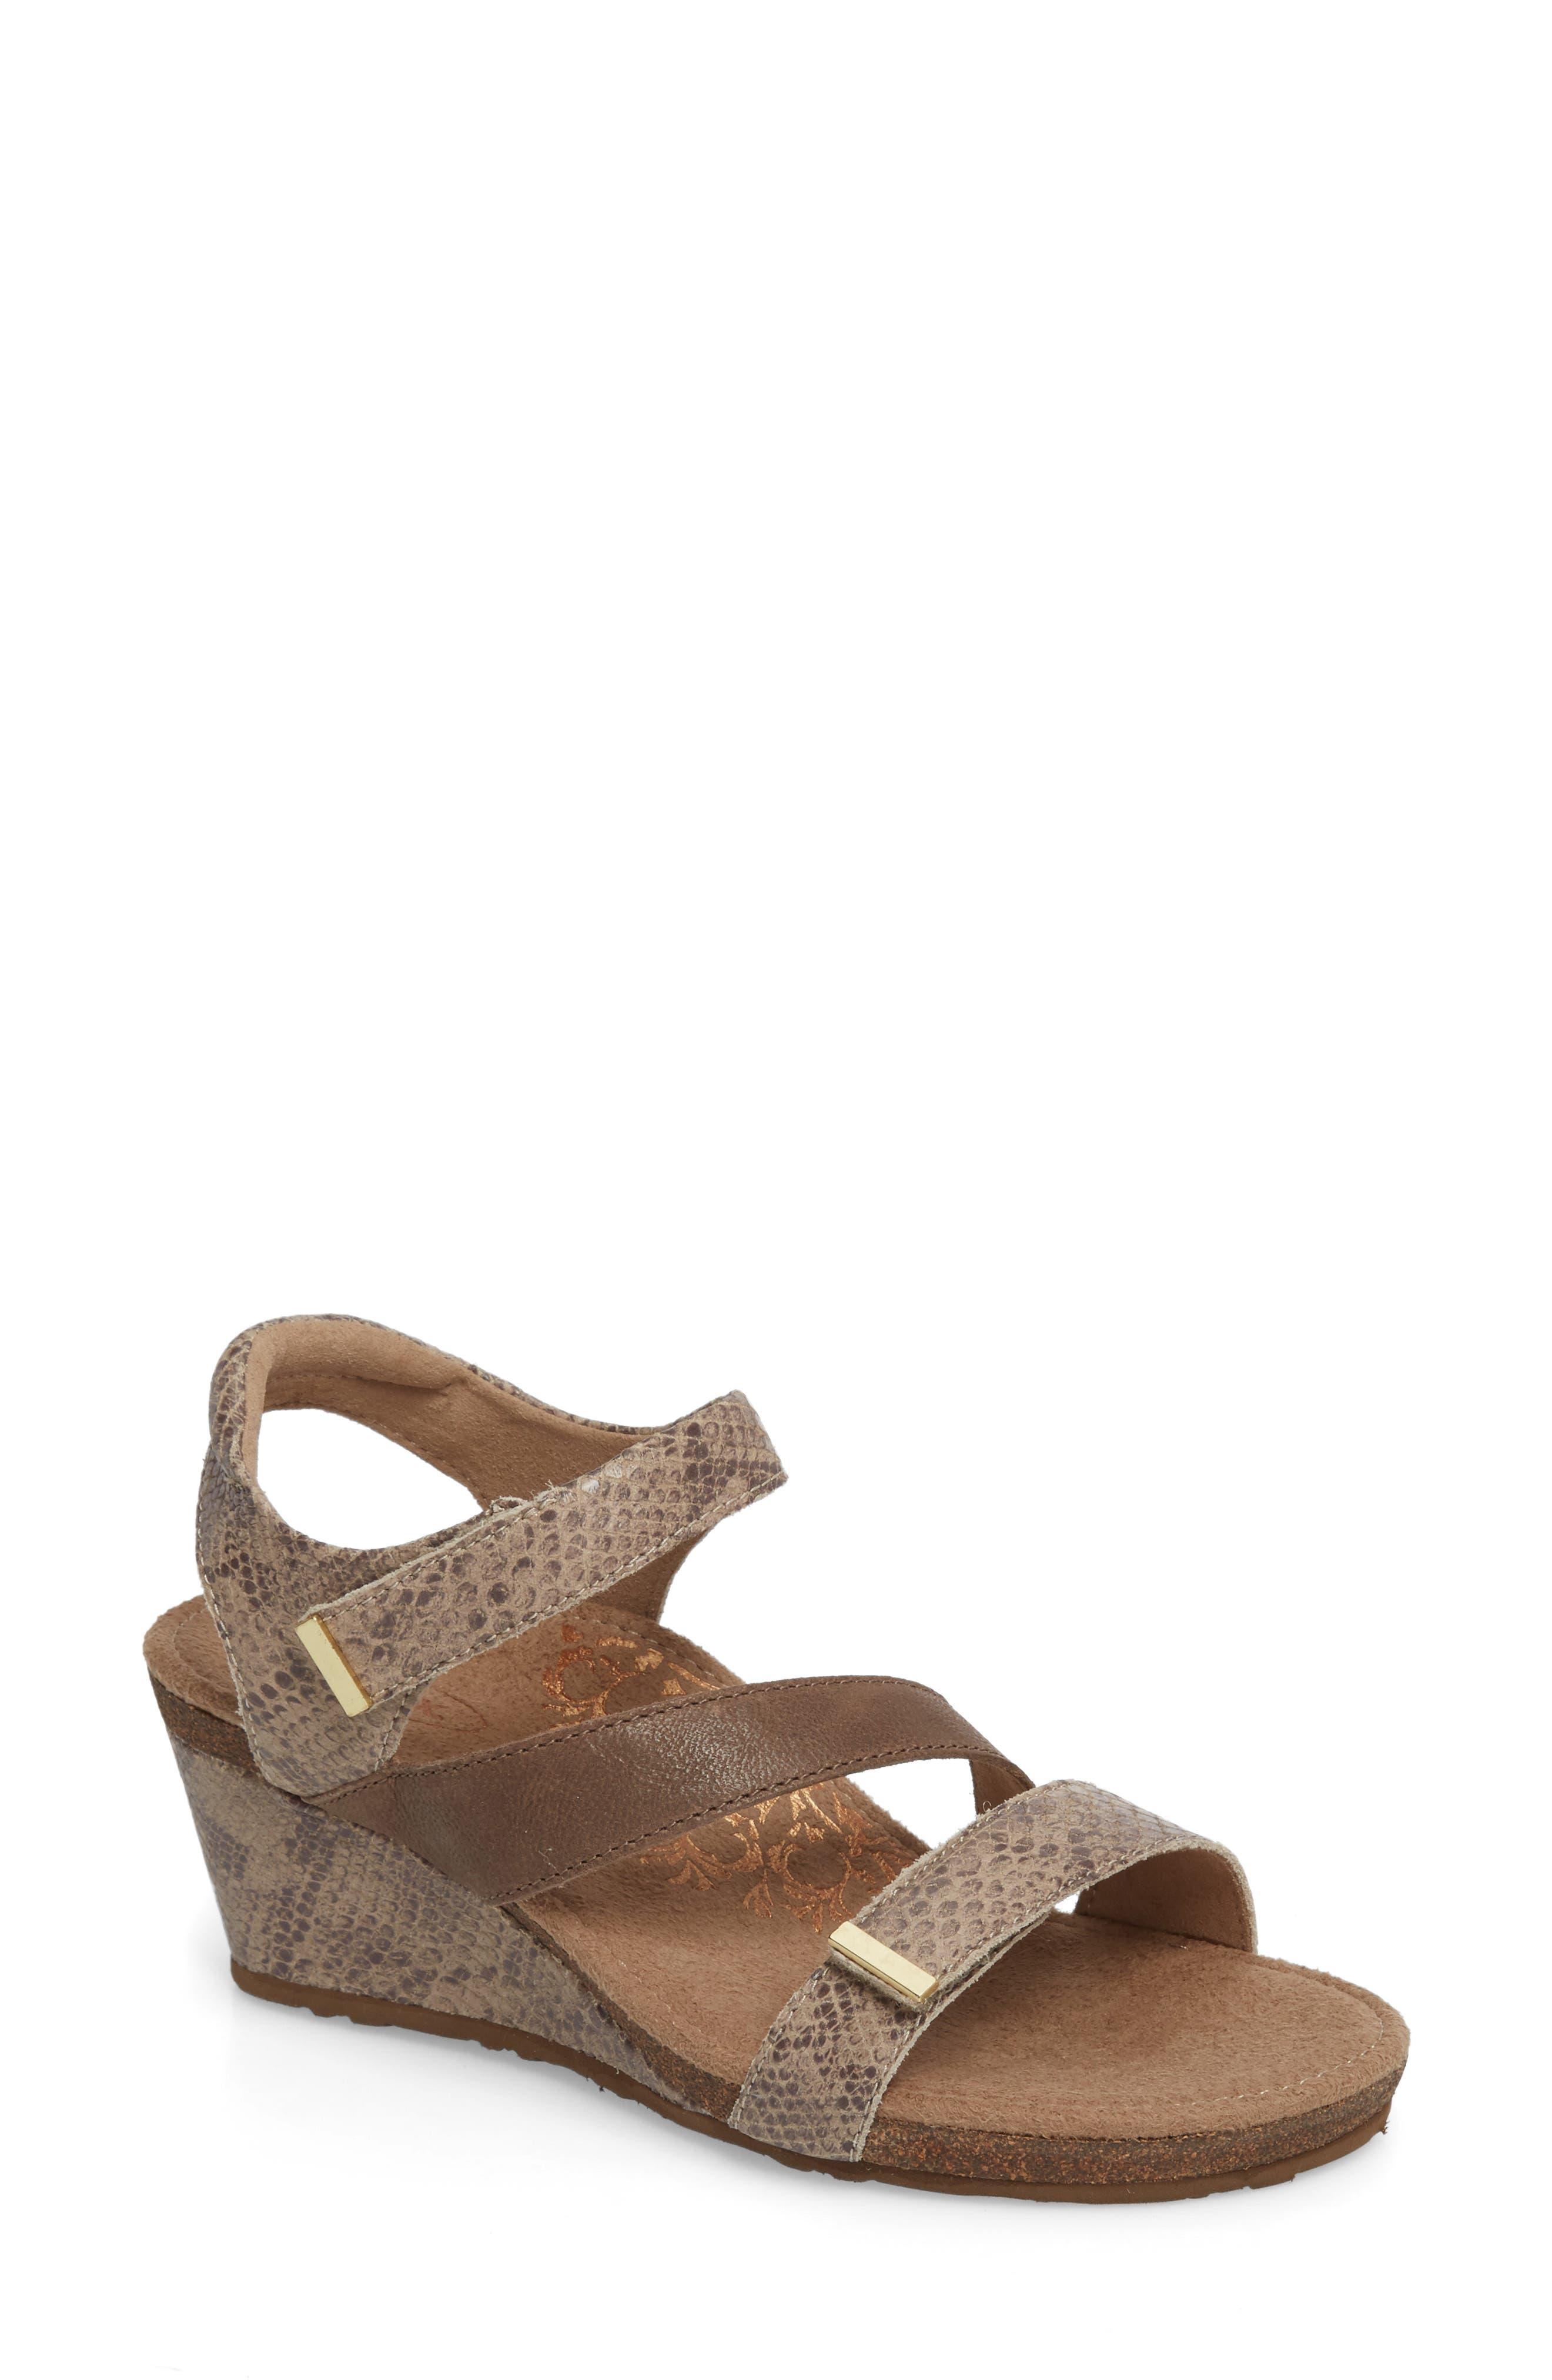 Brynn Asymmetrical Wedge Sandal,                         Main,                         color, STONE SNAKE LEATHER